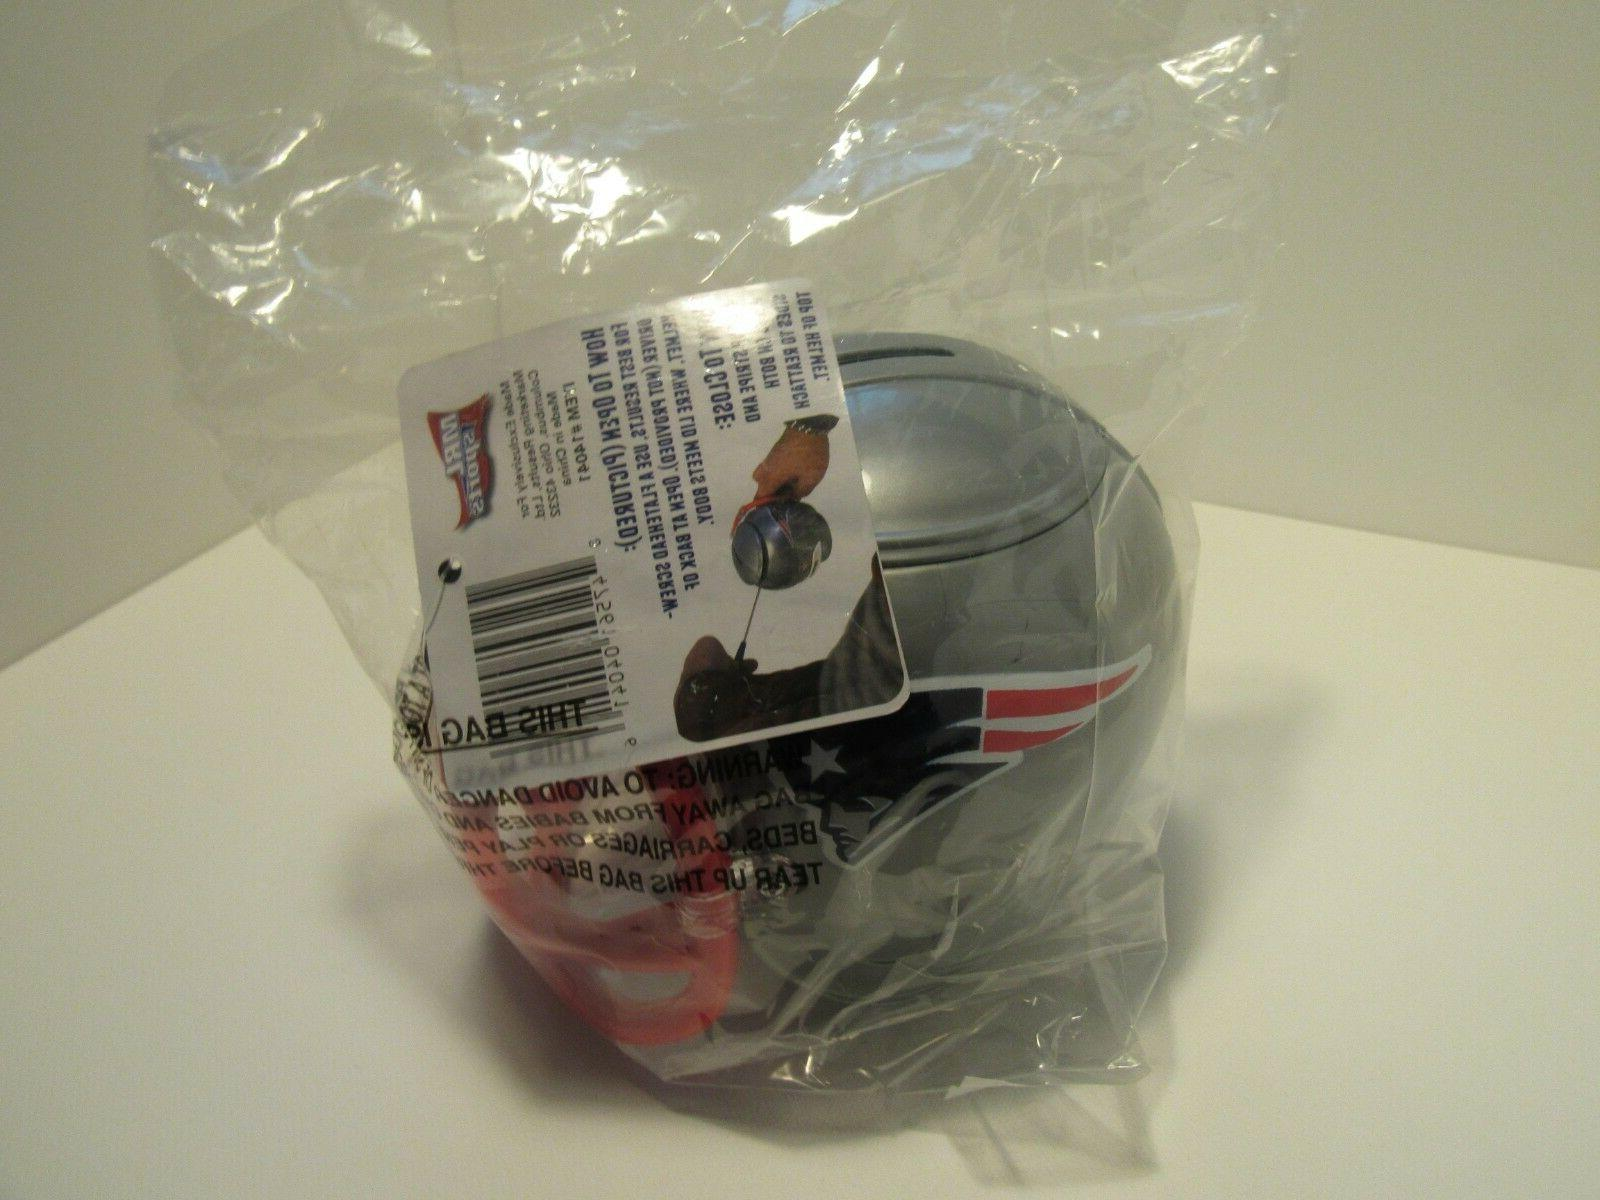 NEW NFL New England Patriots Helmet Bank FanMug Sports